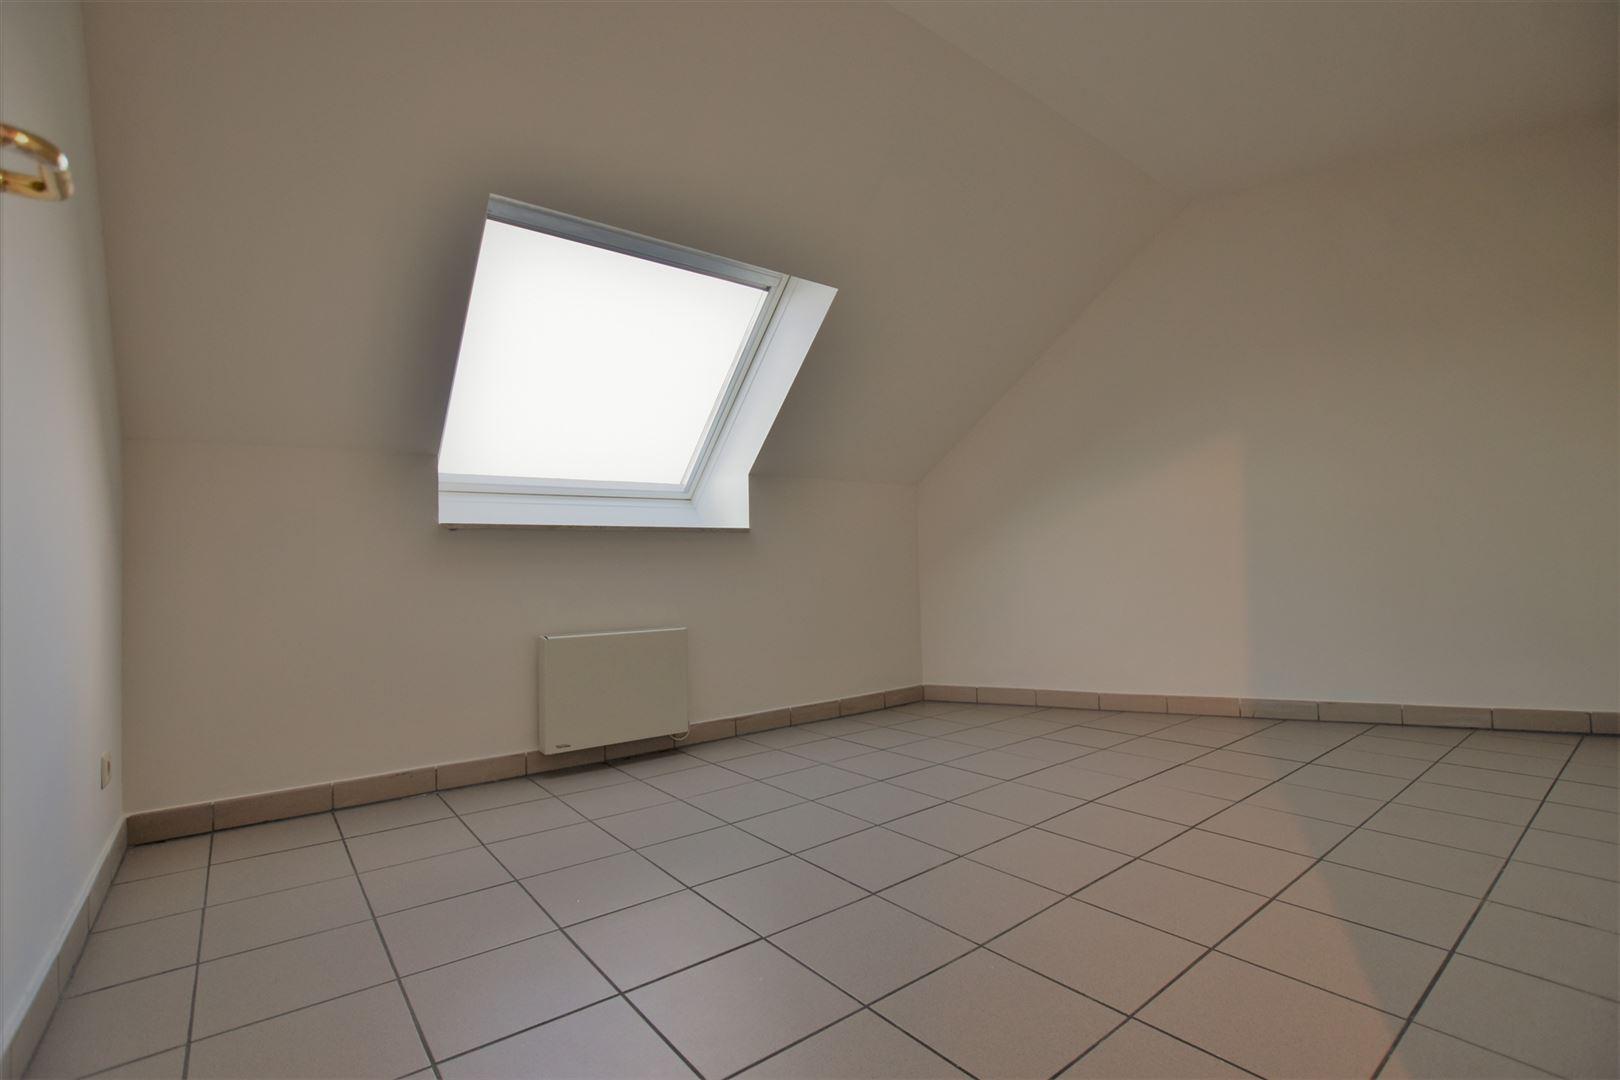 Foto 11 : Appartement te 9280 Lebbeke (België) - Prijs € 645